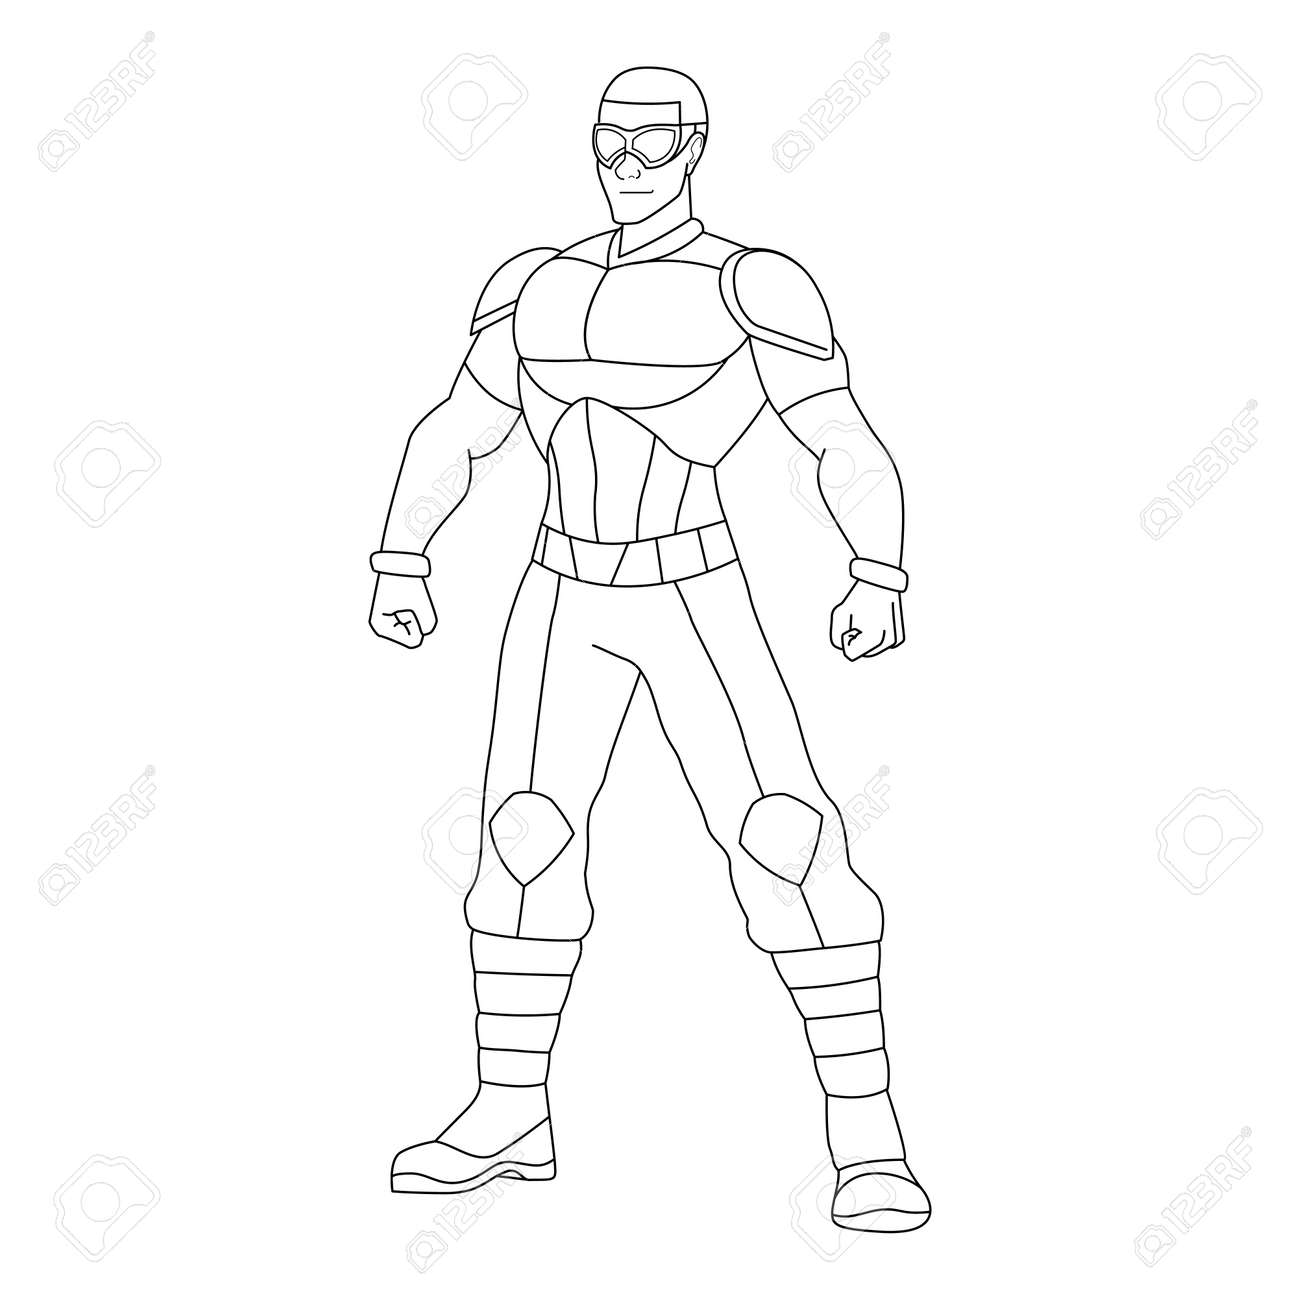 Outline of a superhero cartoon - Vector illustration - 164693159